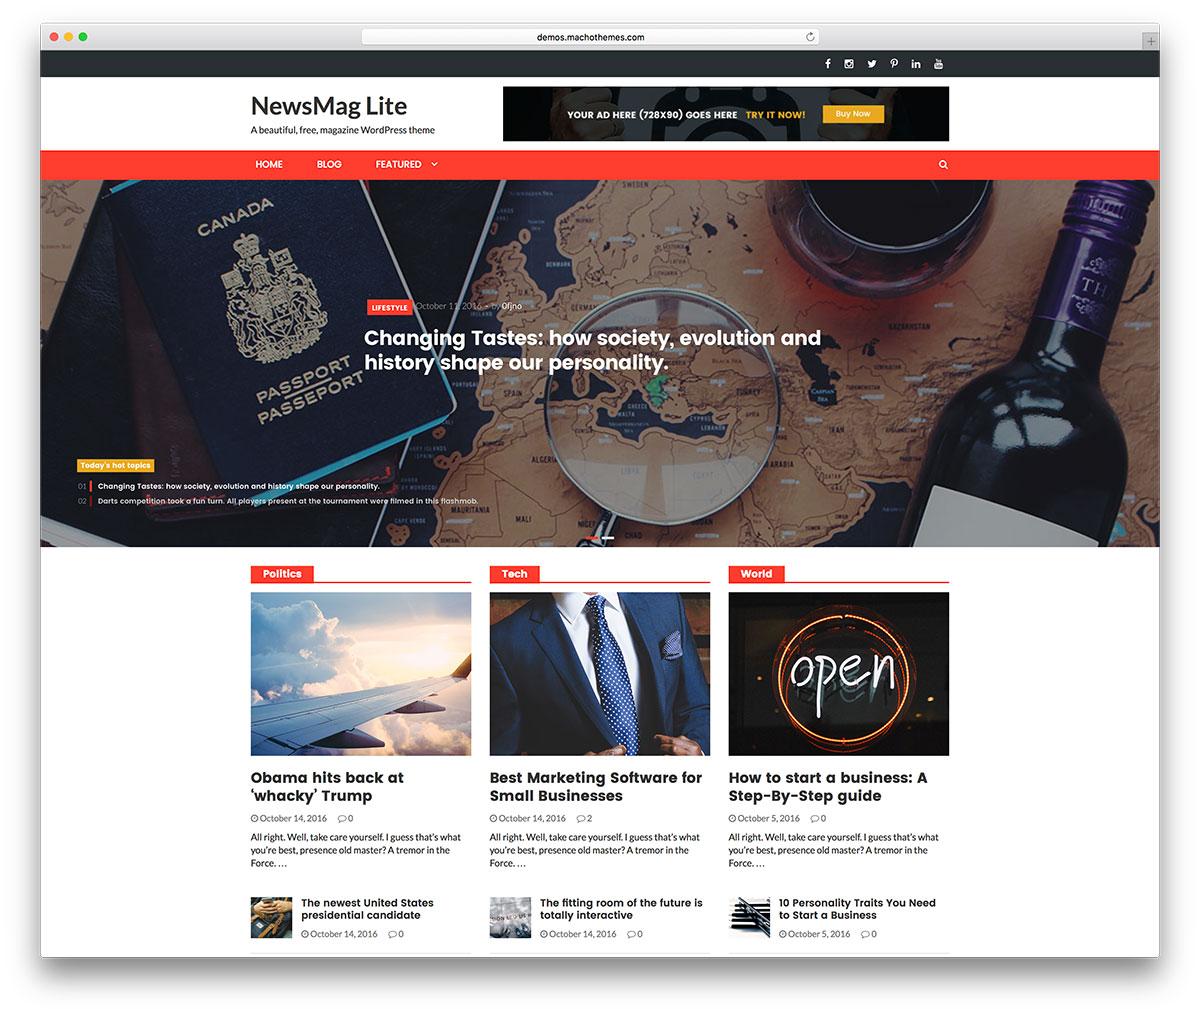 https://cdn.colorlib.com/wp/wp-content/uploads/sites/2/newsmaglite-free-magazine-wordpress-theme.jpg